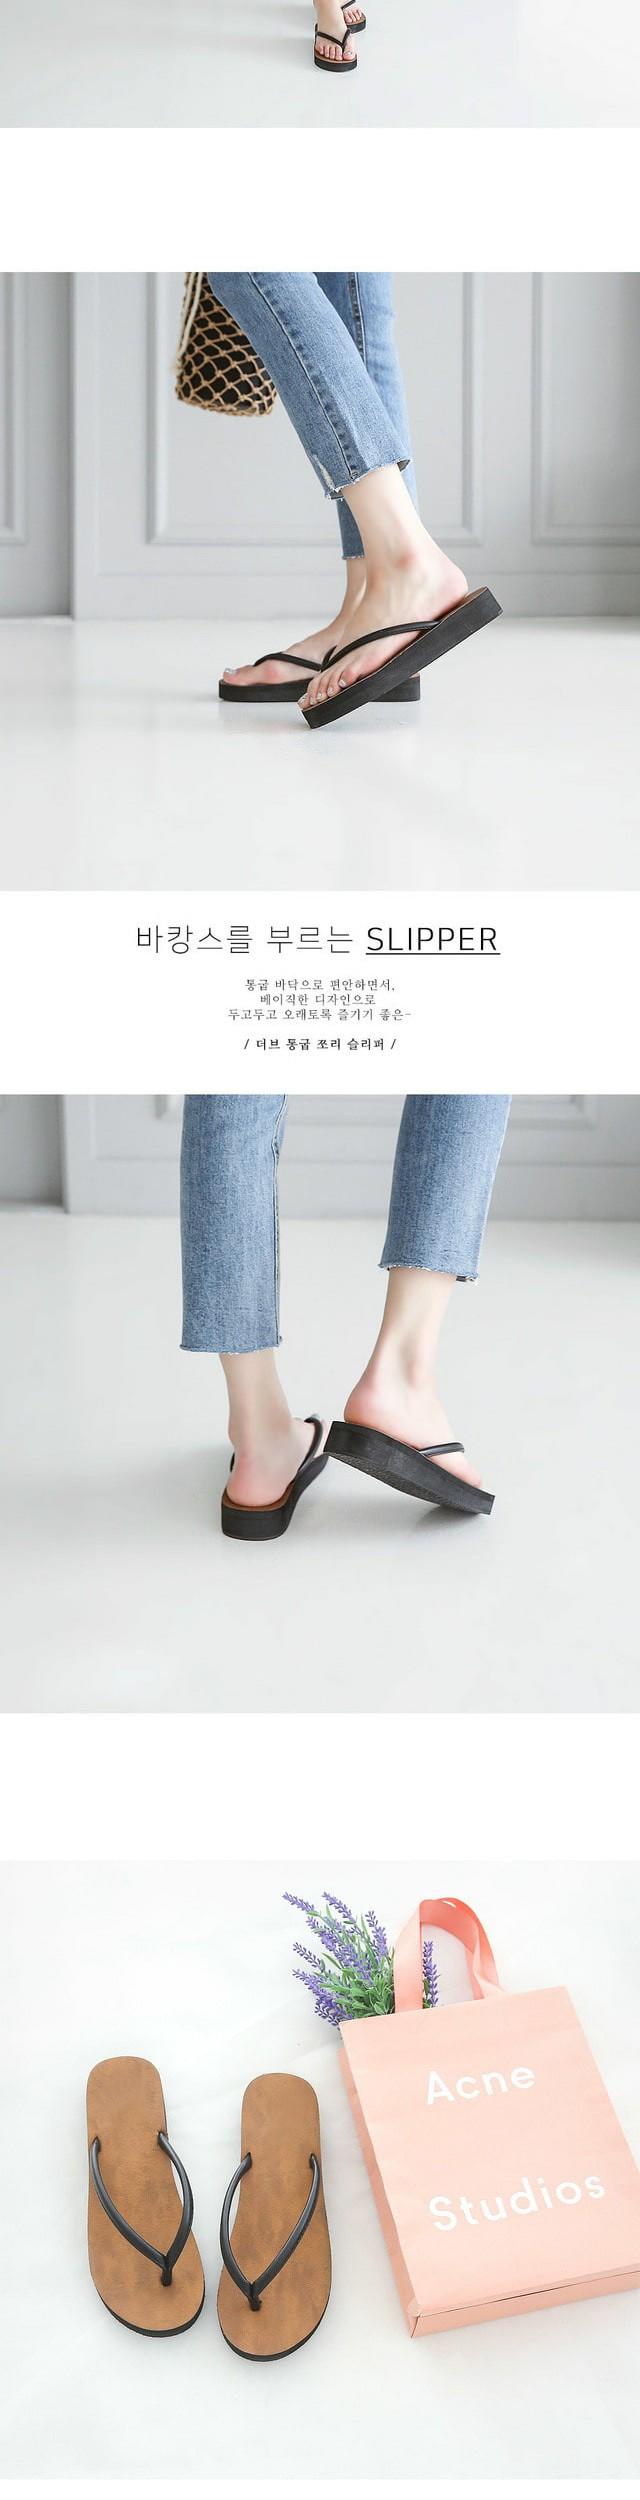 Dub sleeper slippers 3cm